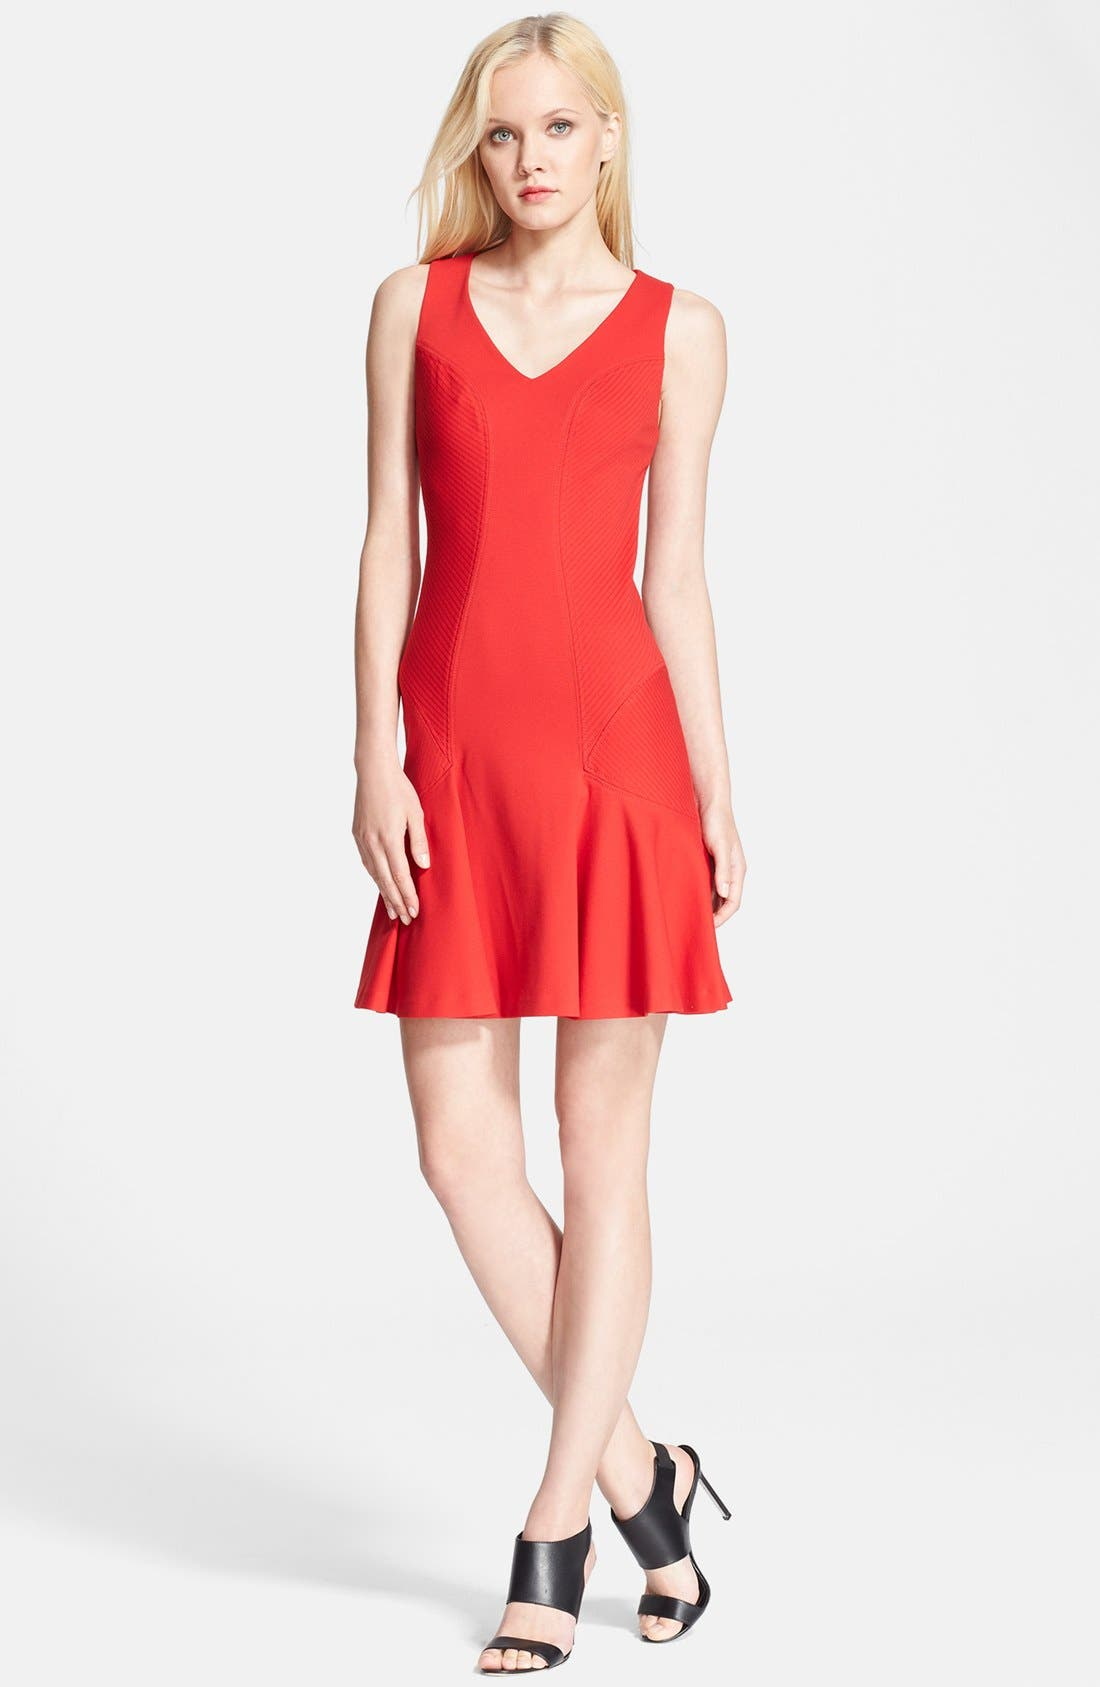 Main Image - Diane von Furstenberg 'Carla' Knit Fit & Flare Dress